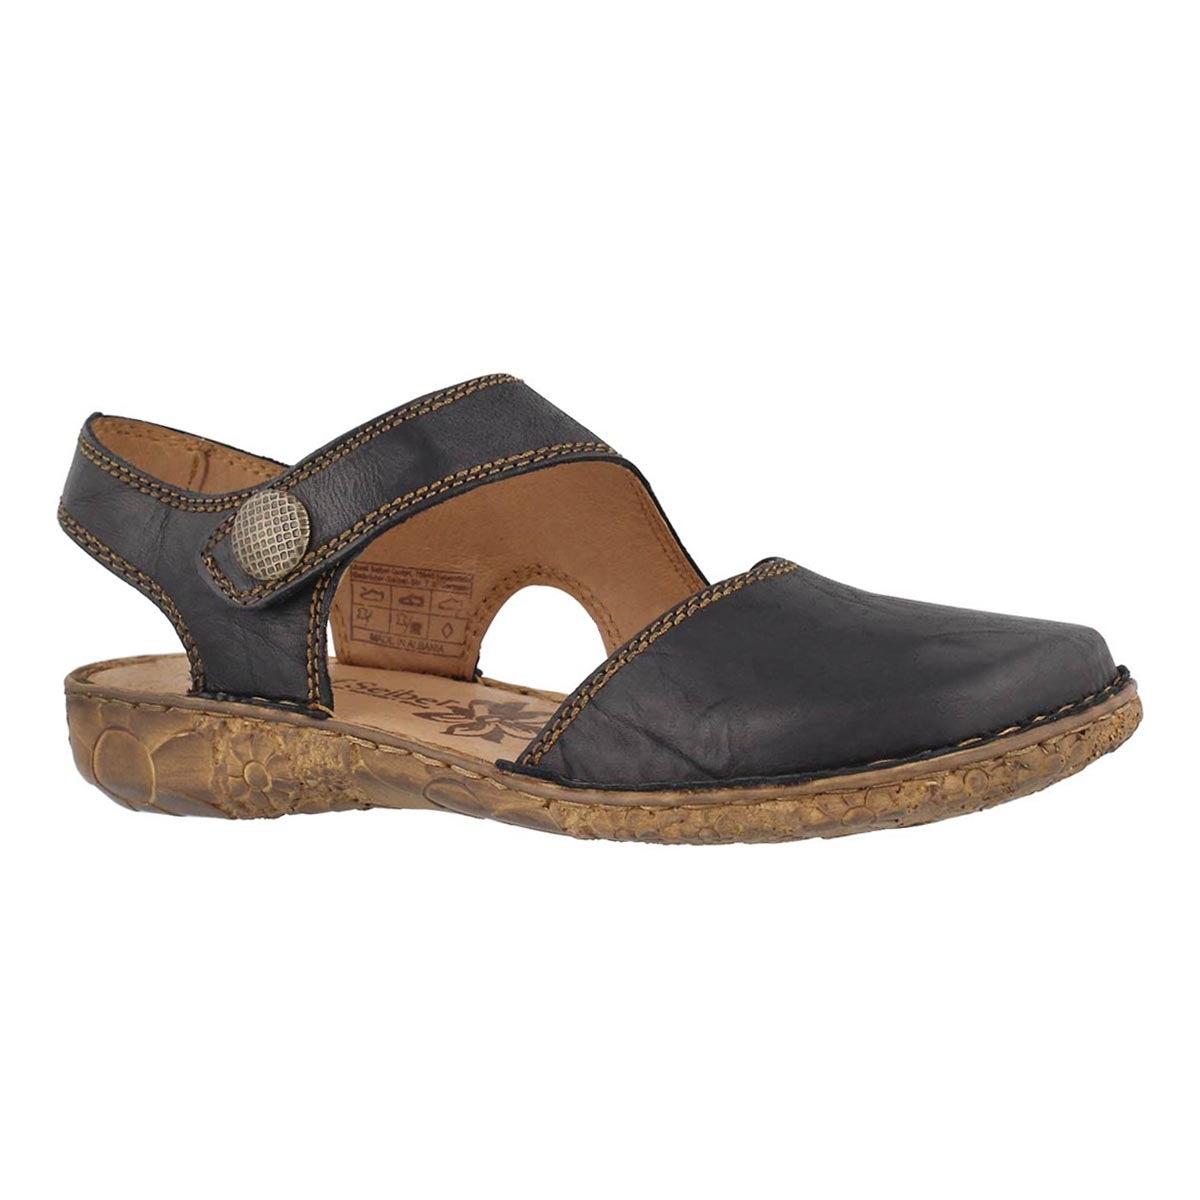 Women's ROSALIE 27 black casual sandal